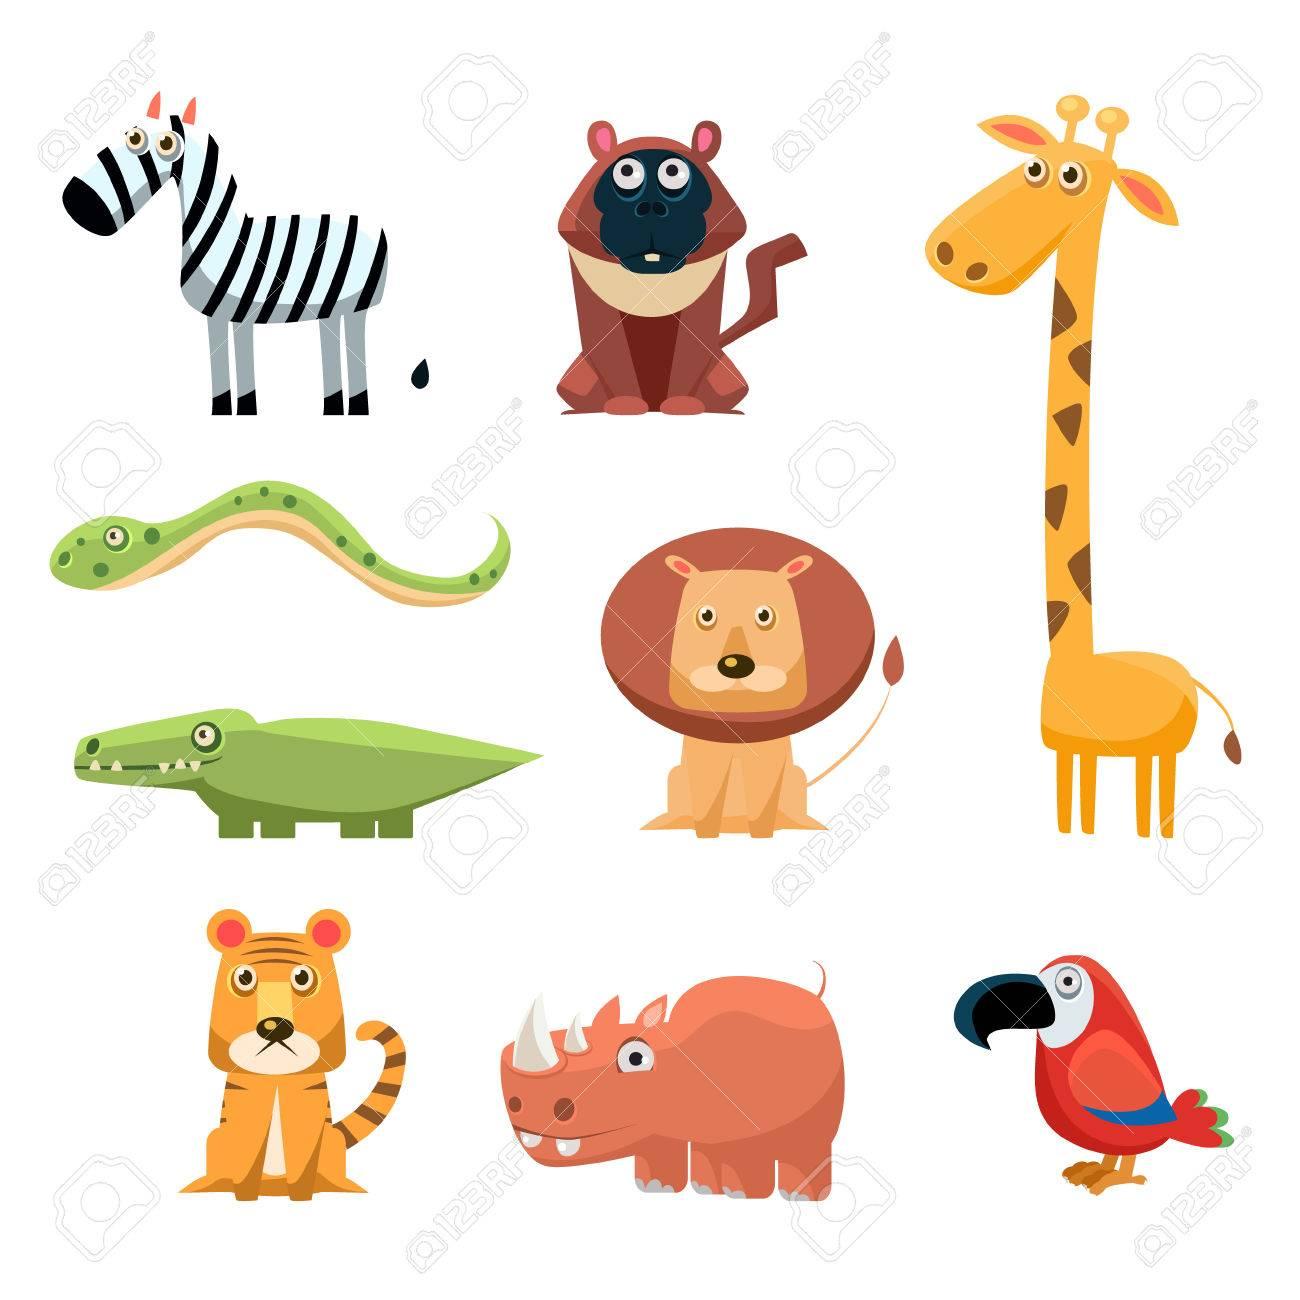 african animals fun cartoon clip art collection royalty free rh 123rf com free cartoon clip art people free cartoon clipart downloads